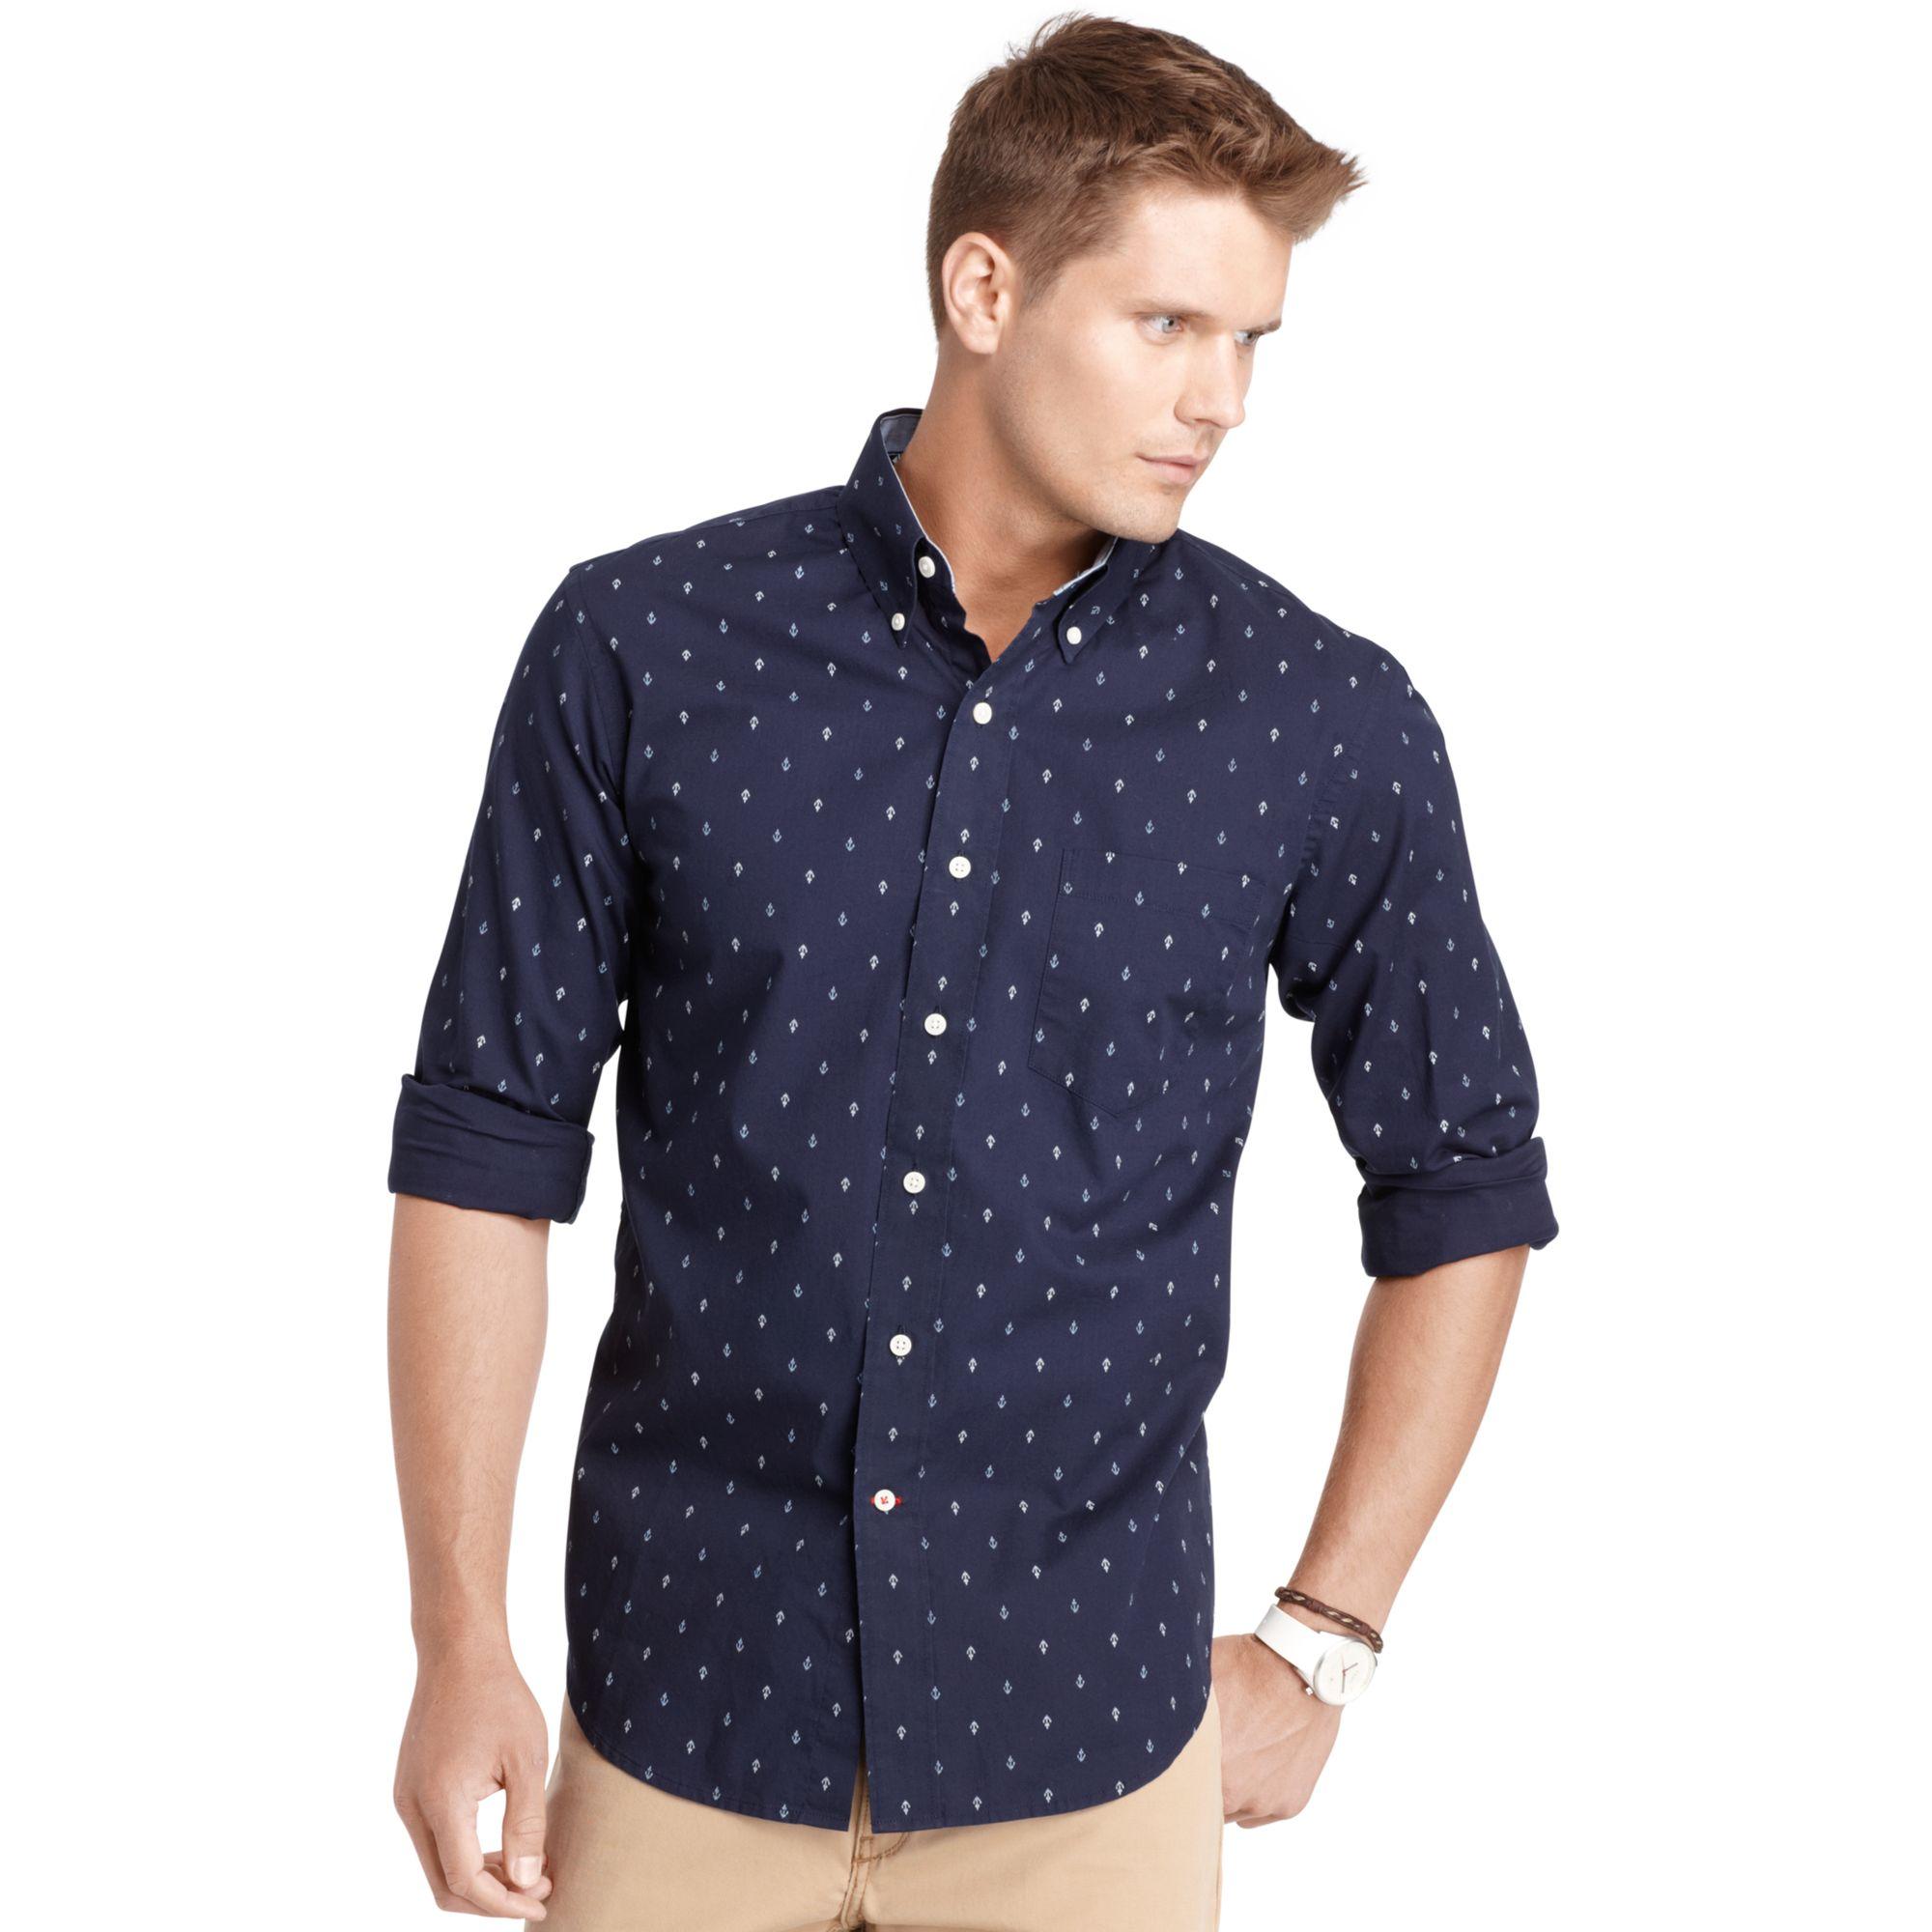 Lyst Izod Long Sleeve Anchor Print Shirt In Blue For Men